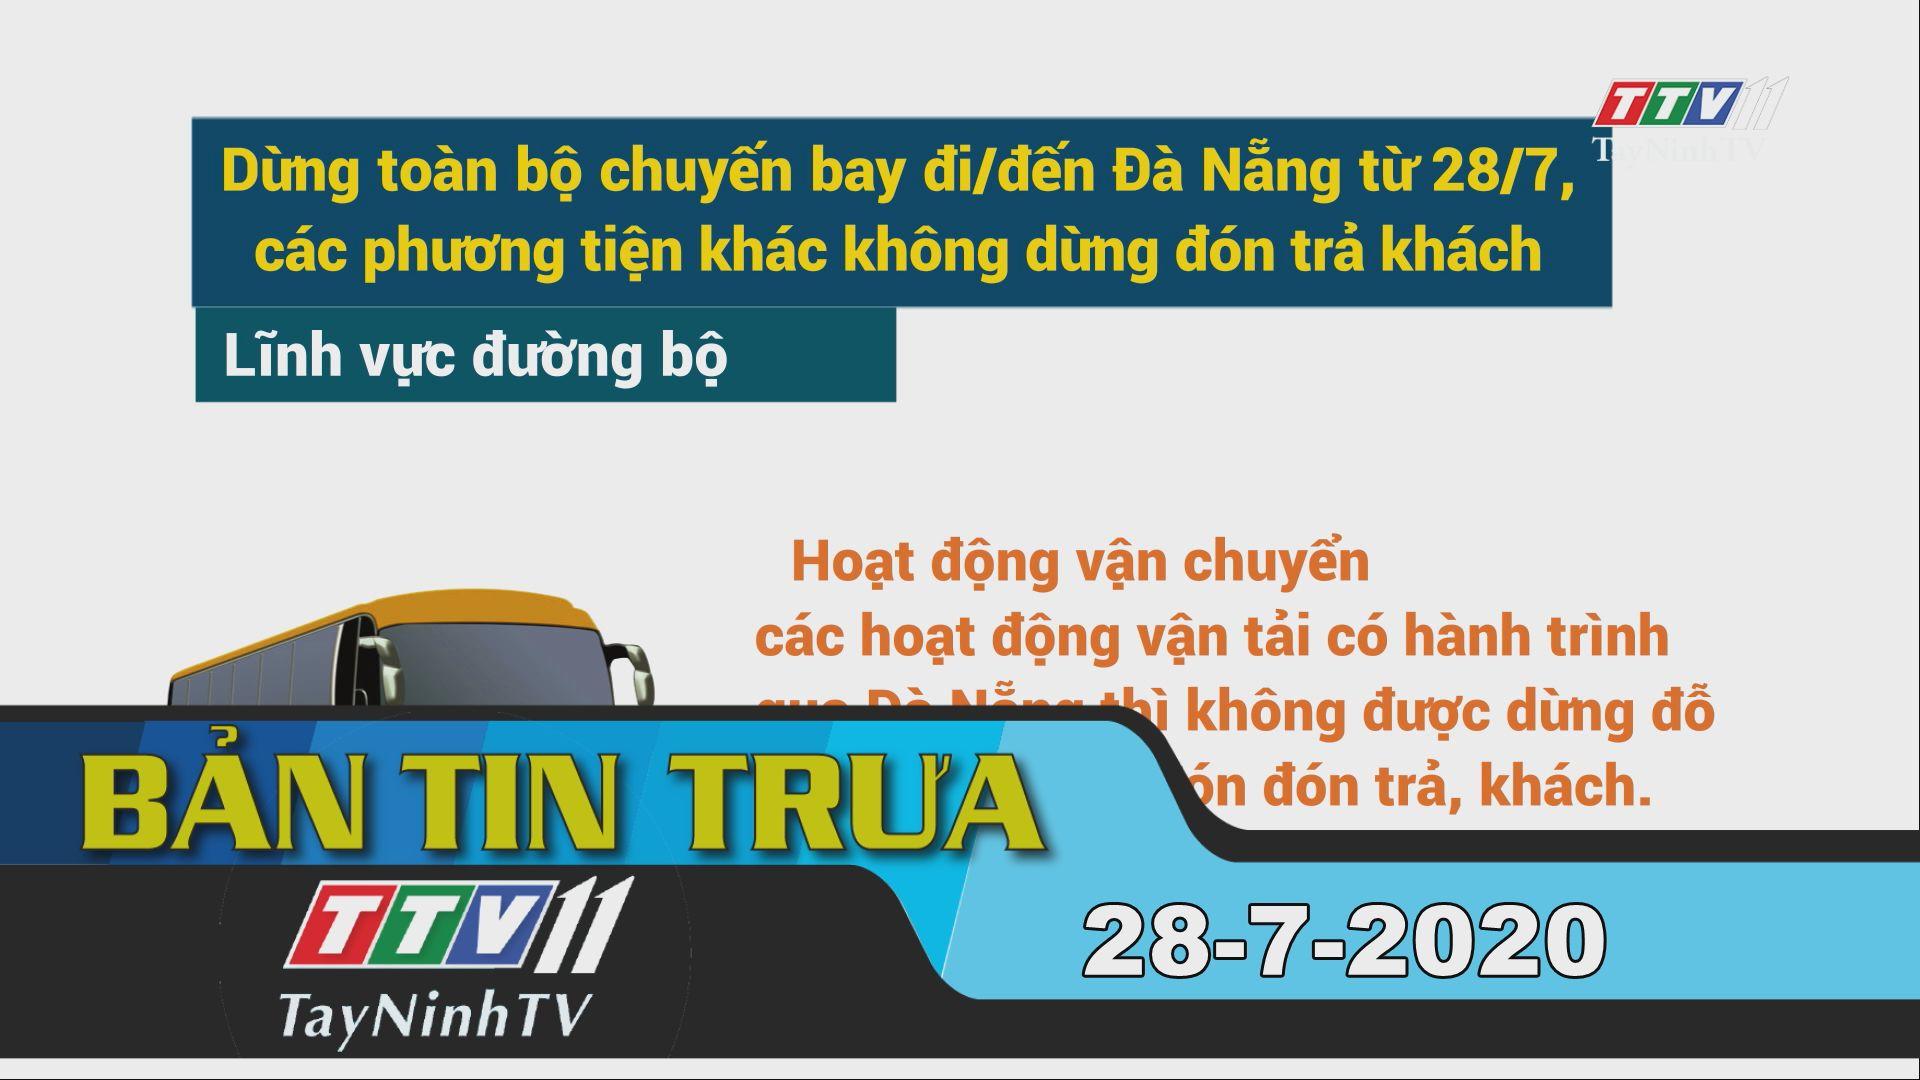 Bản tin trưa 28-7-2020 | Tin tức hôm nay | TayNinhTV